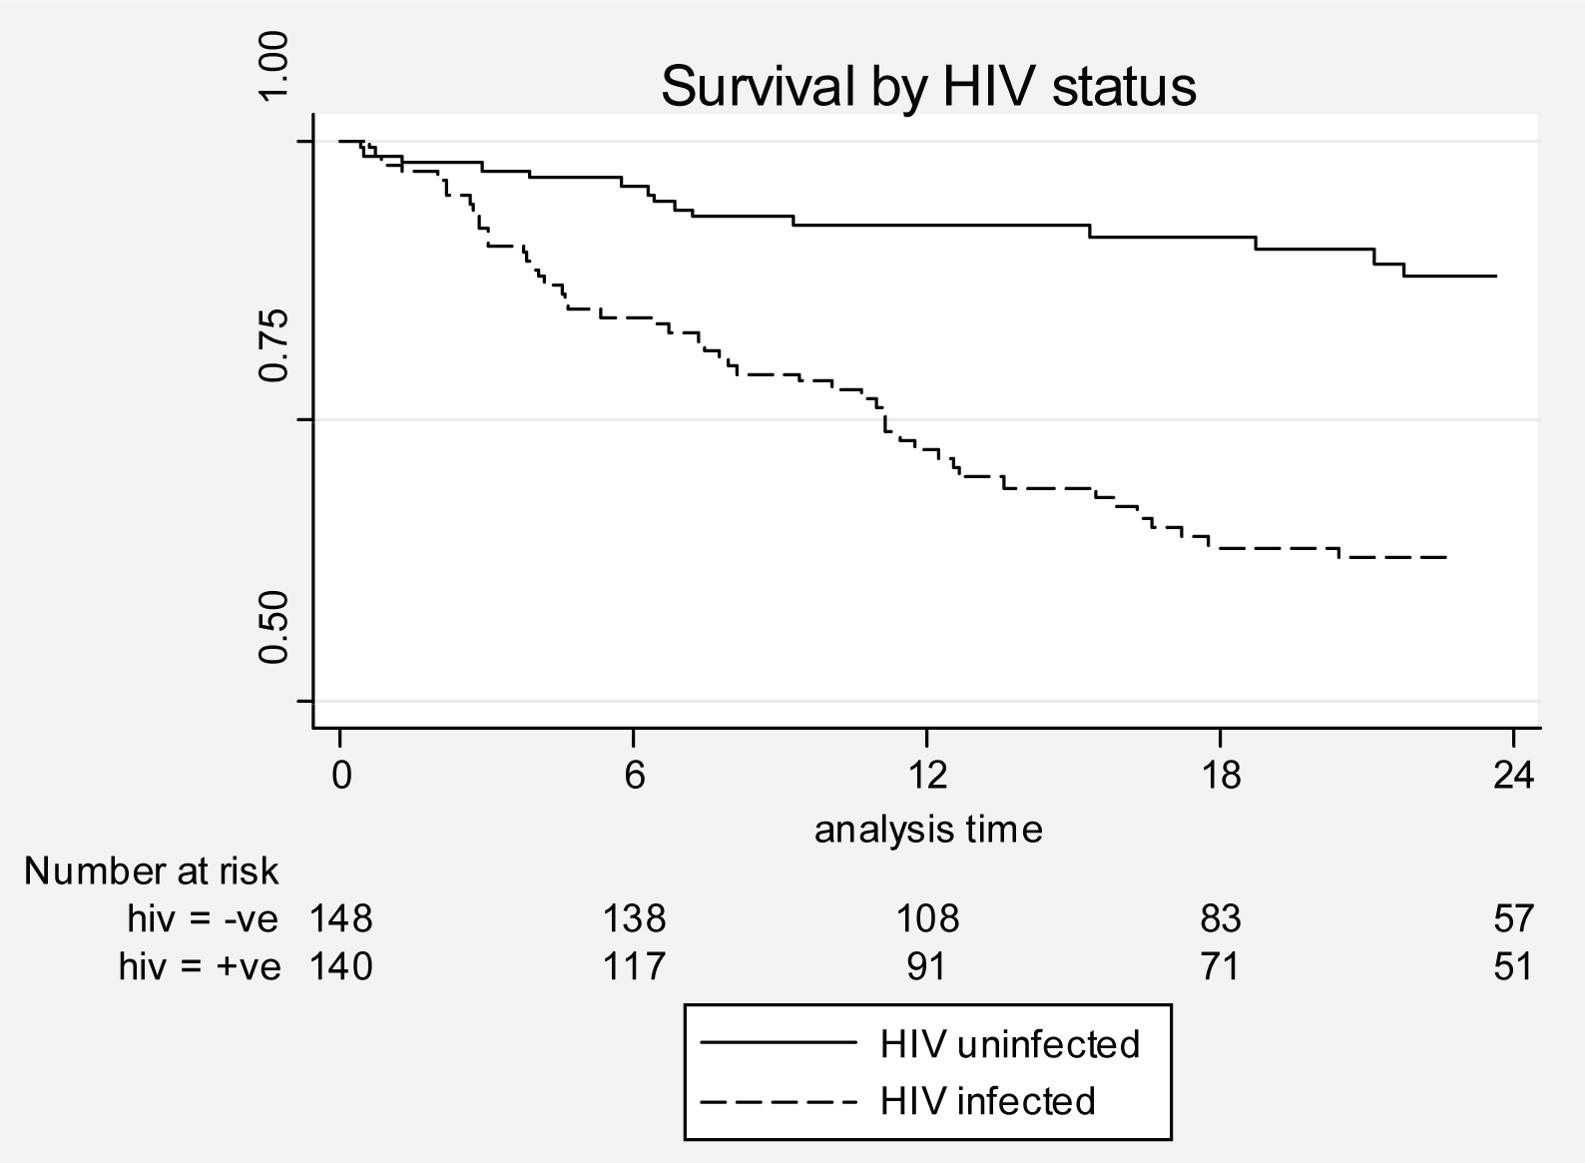 Kaplan-Meier curves by HIV status.